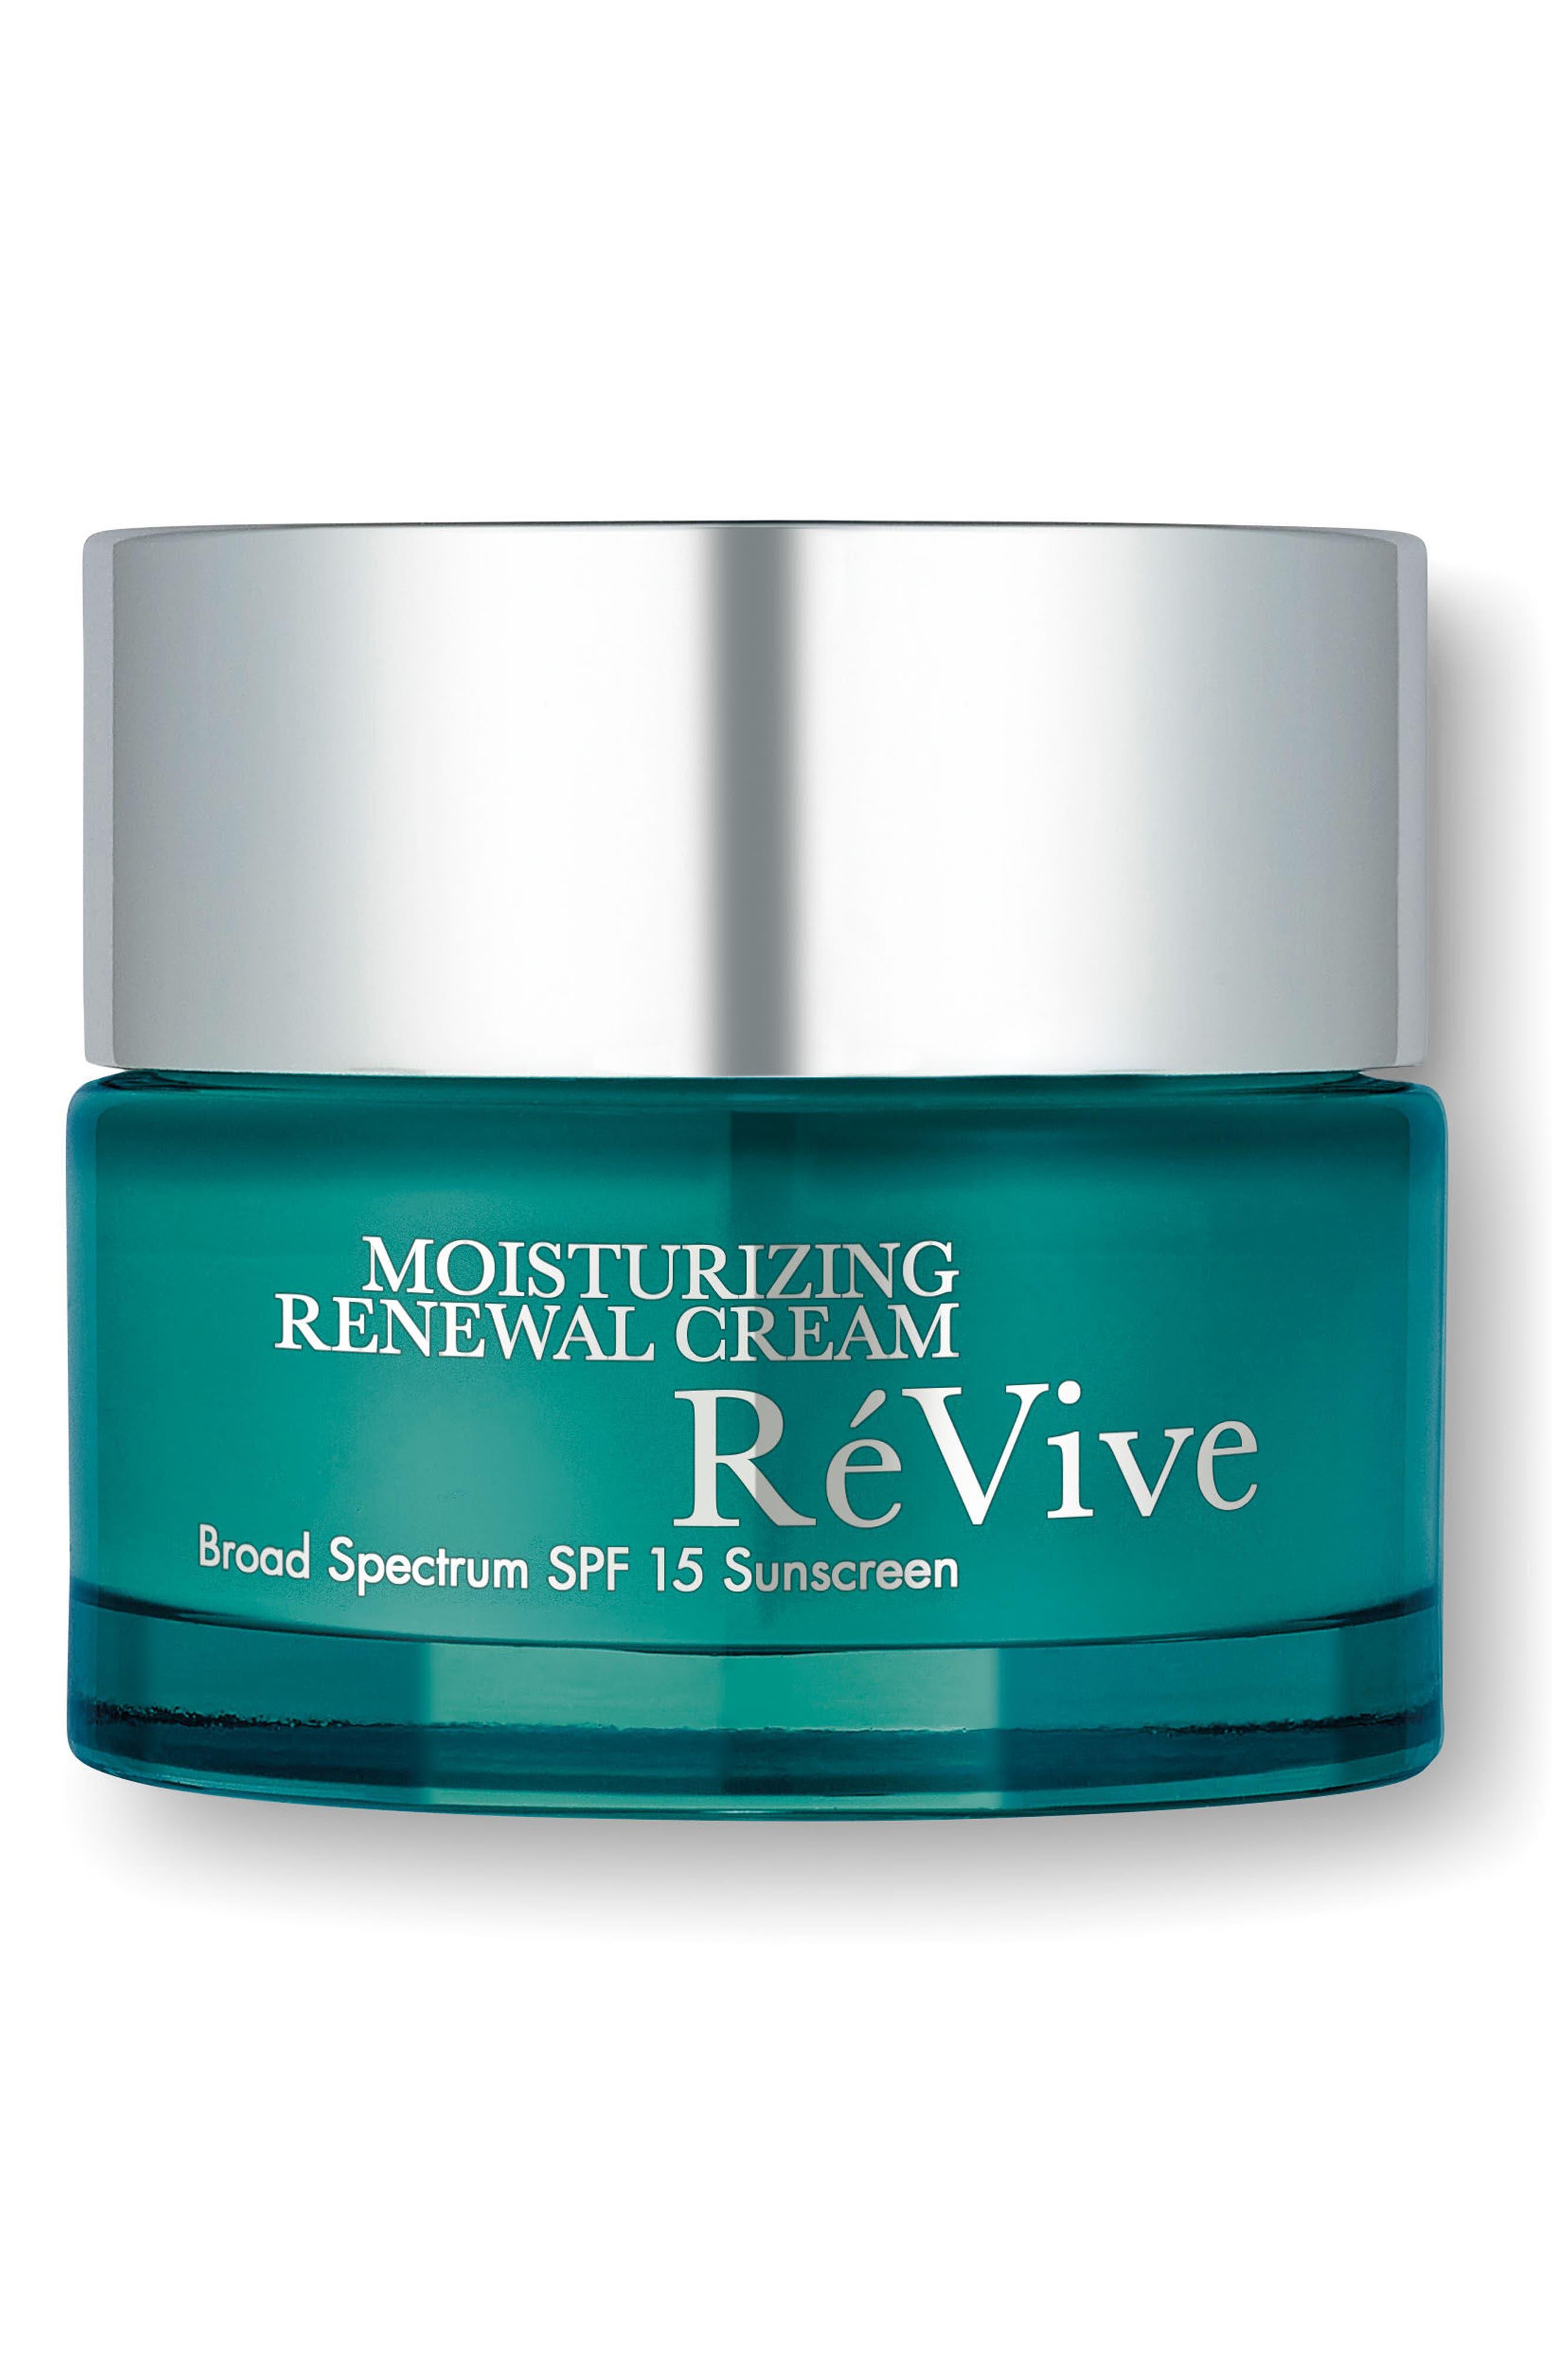 Moisturizing Renewal Cream Broad Spectrum SPF 15 Sunscreen,                         Main,                         color, None